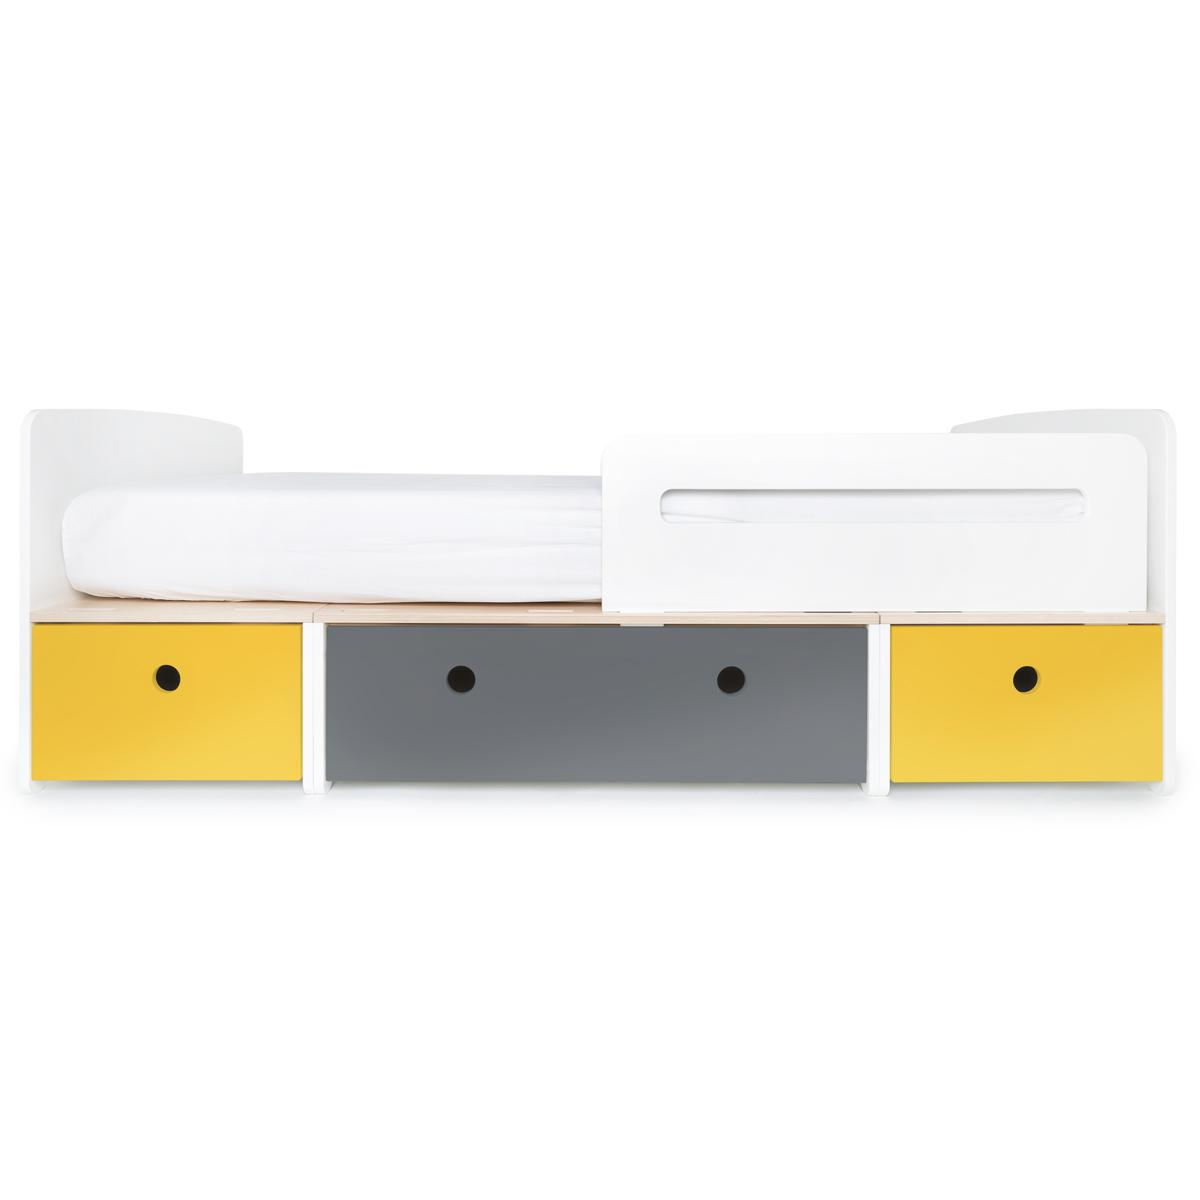 Lit évolutif 90x200cm COLORFLEX nectar yellow-space grey-nectar yellow